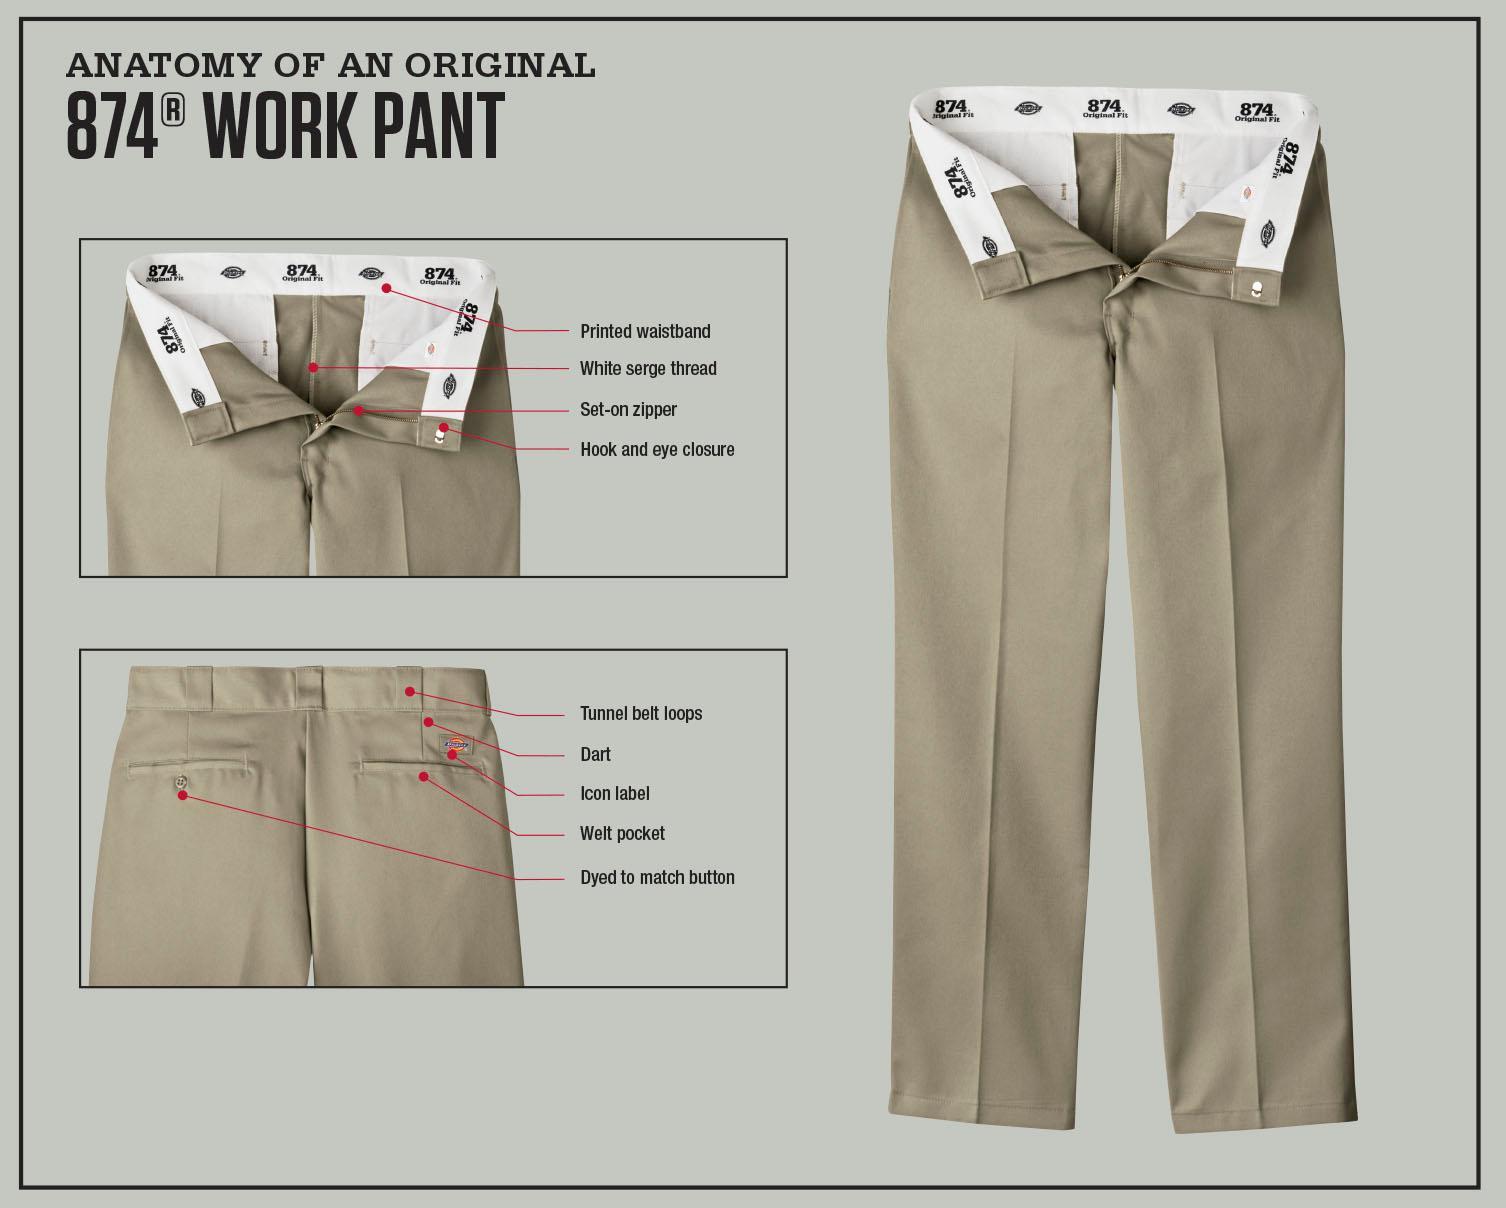 c063fd6ee3e Amazon.com  Dickies Work Clothes  Men s Stain Release Khaki Work ...